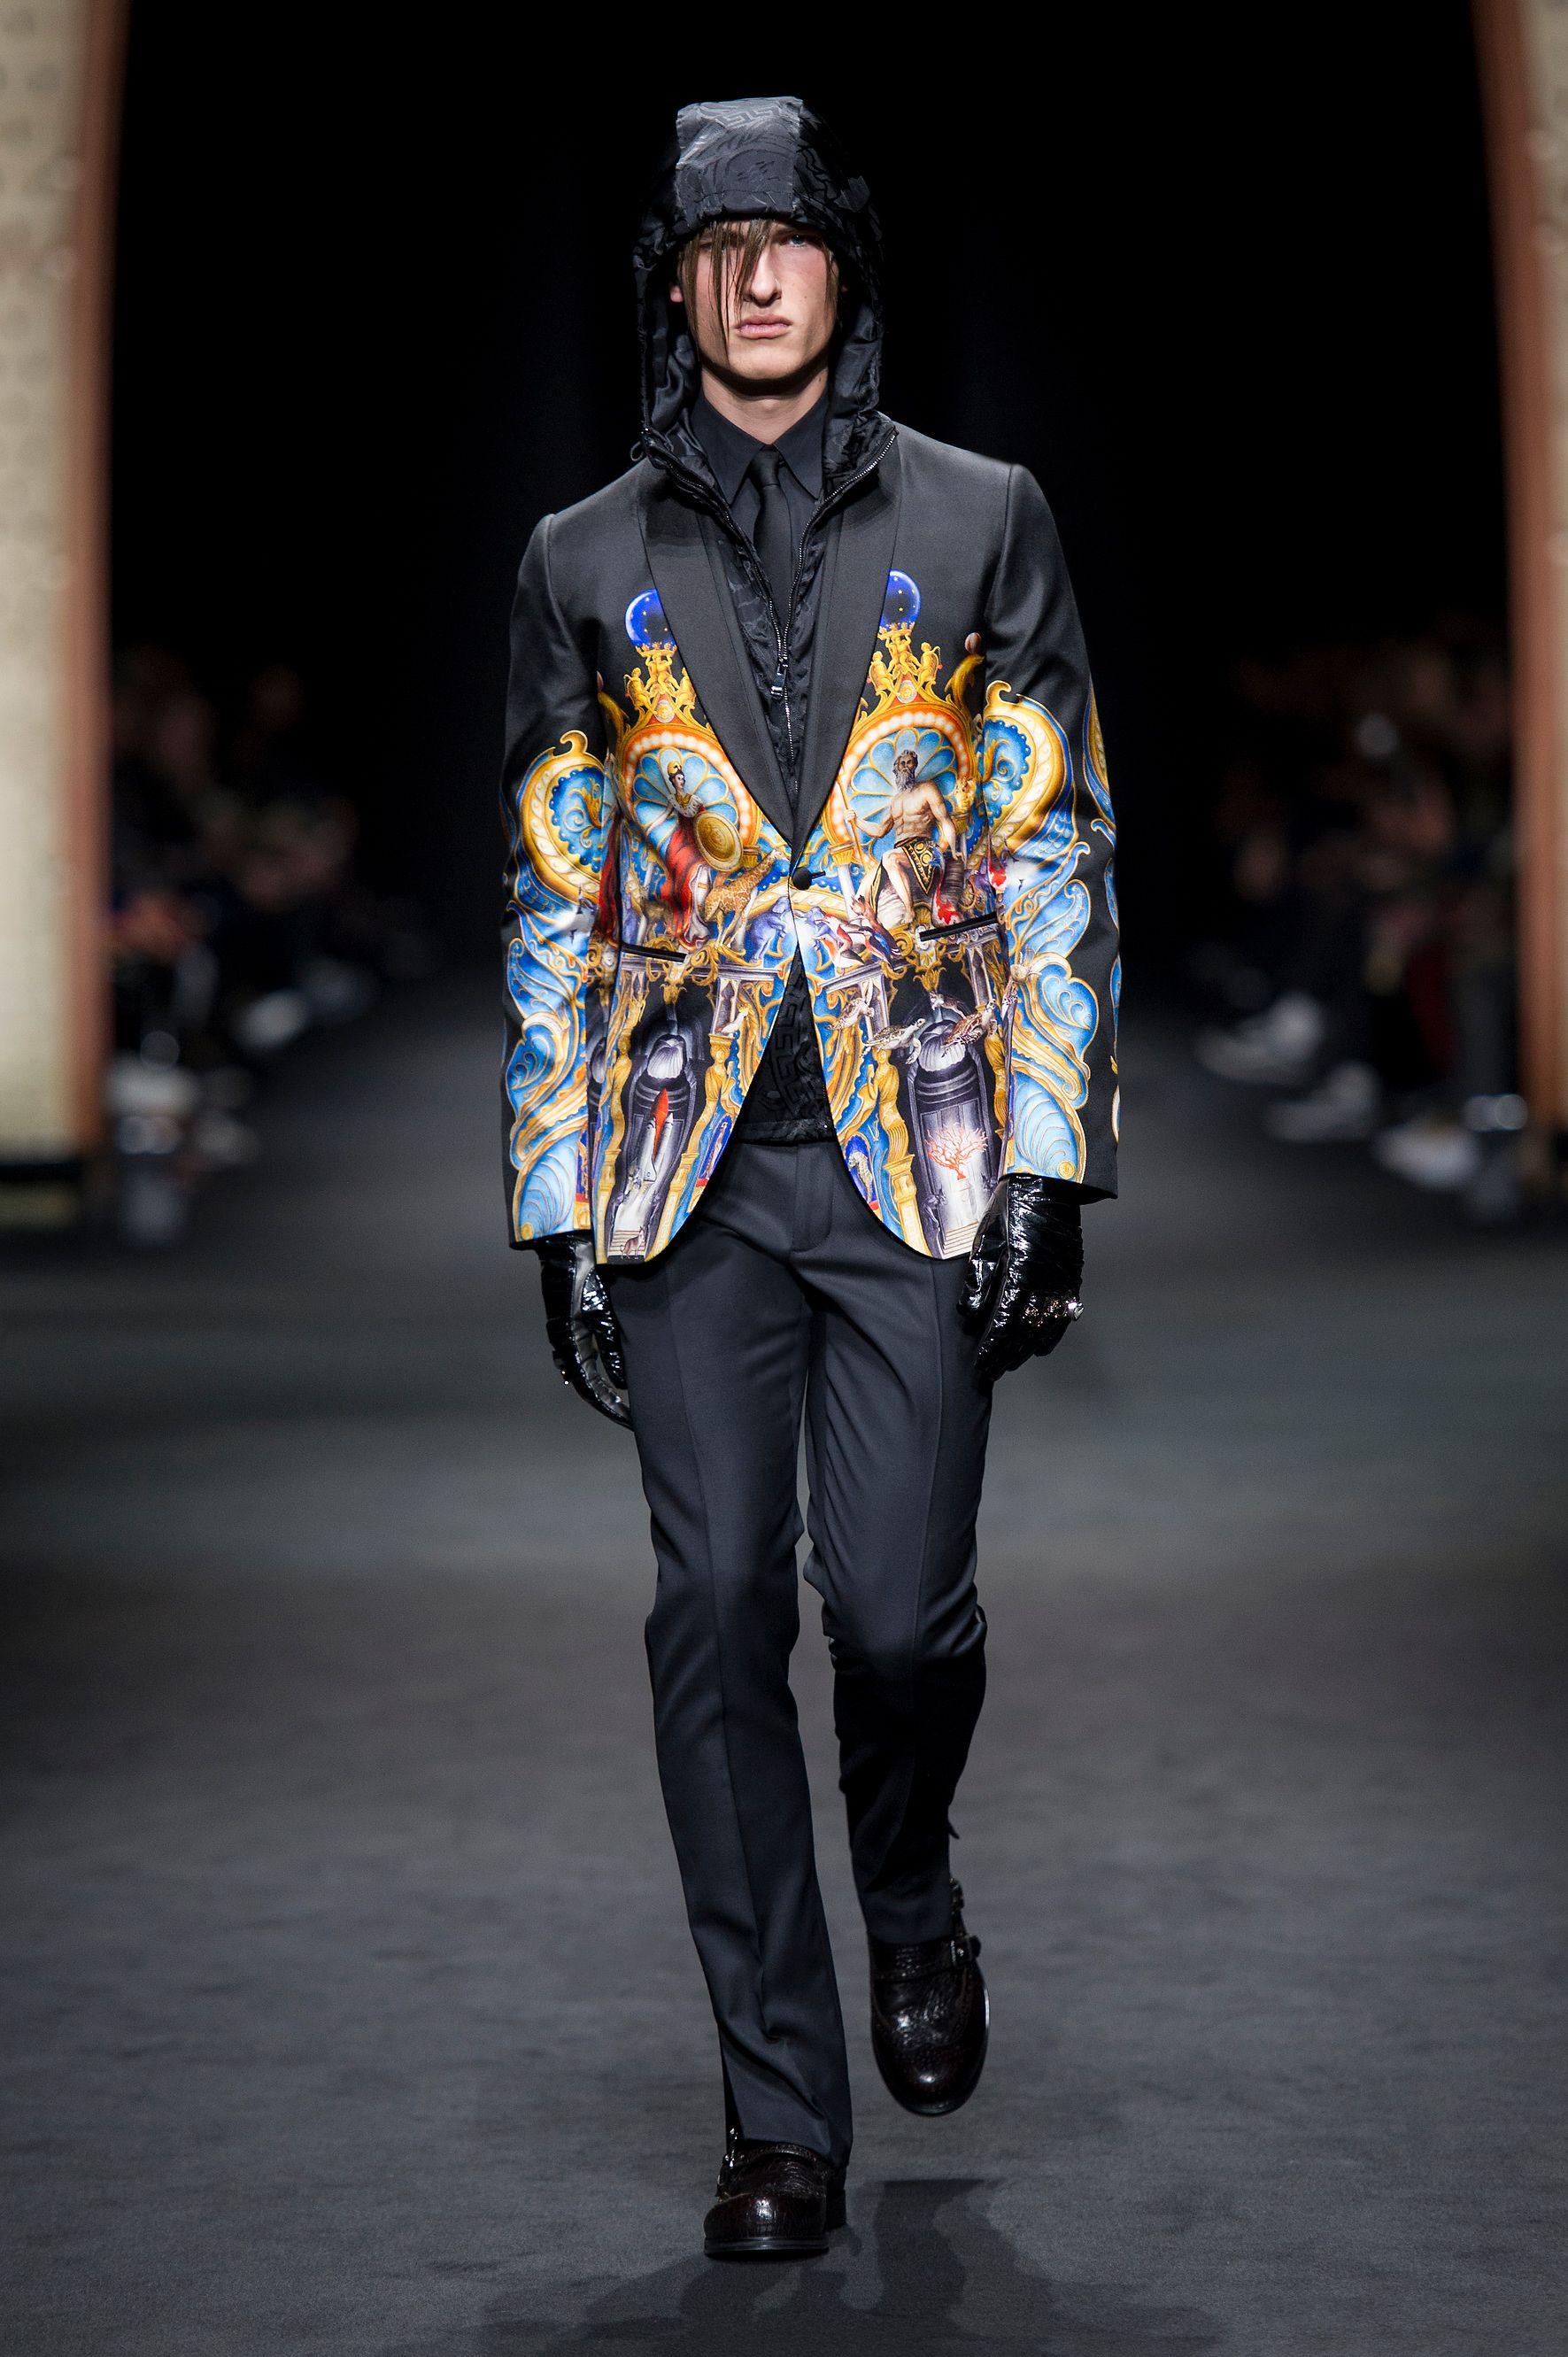 look 37 versace men 39 s fall winter 2017 show versace menswear fall winter 2017 pinterest. Black Bedroom Furniture Sets. Home Design Ideas